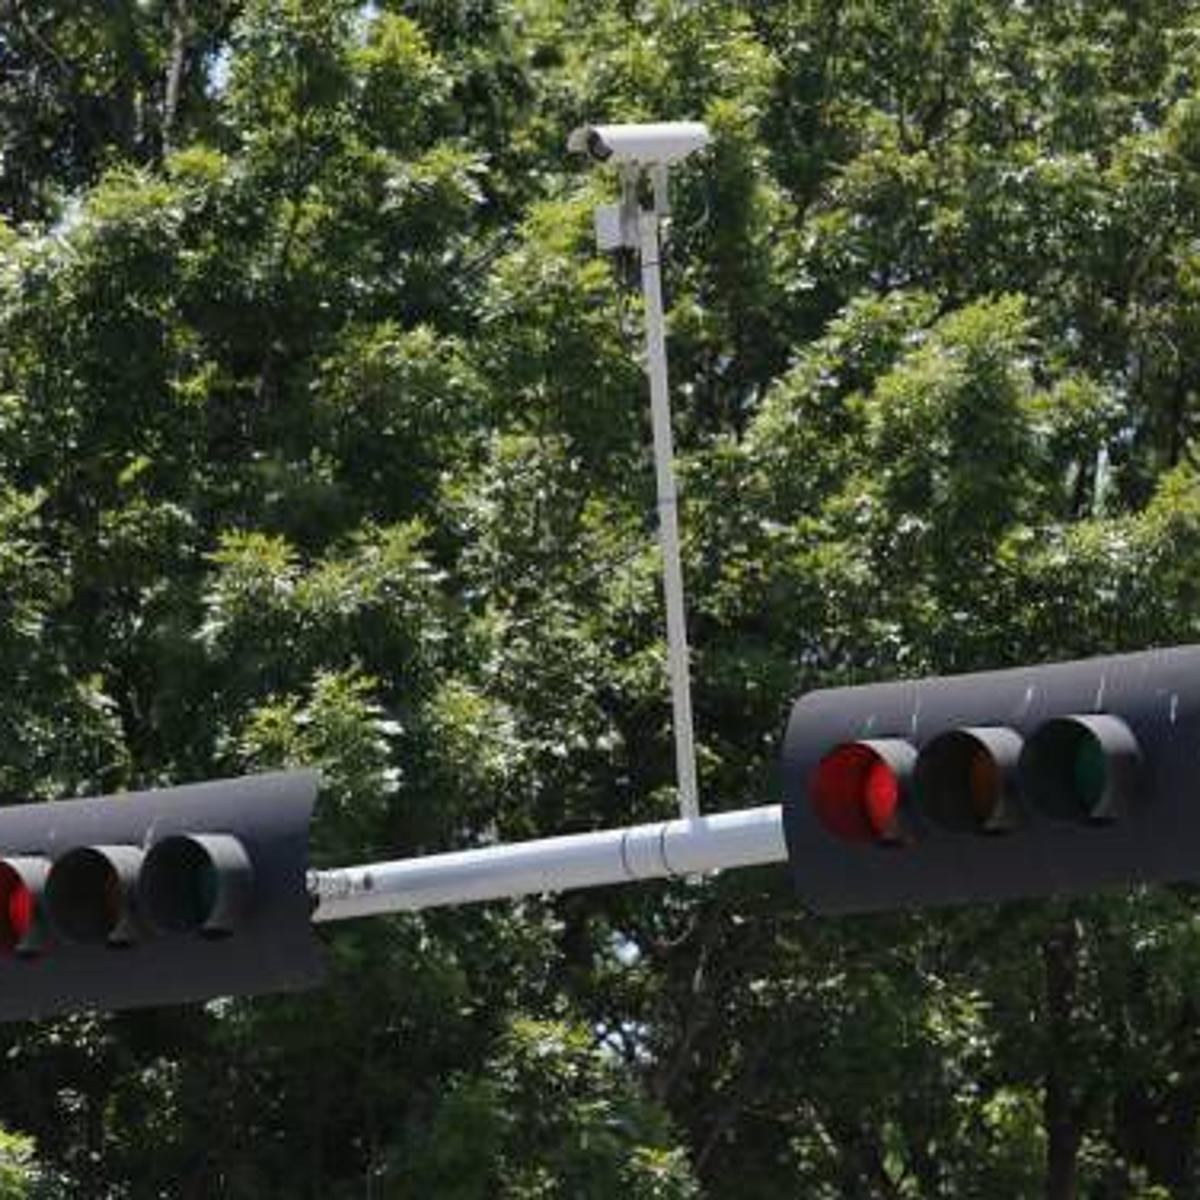 Bill Banning Red Light Cameras Passes Oklahoma Senate State And Regional News Tulsaworld Com